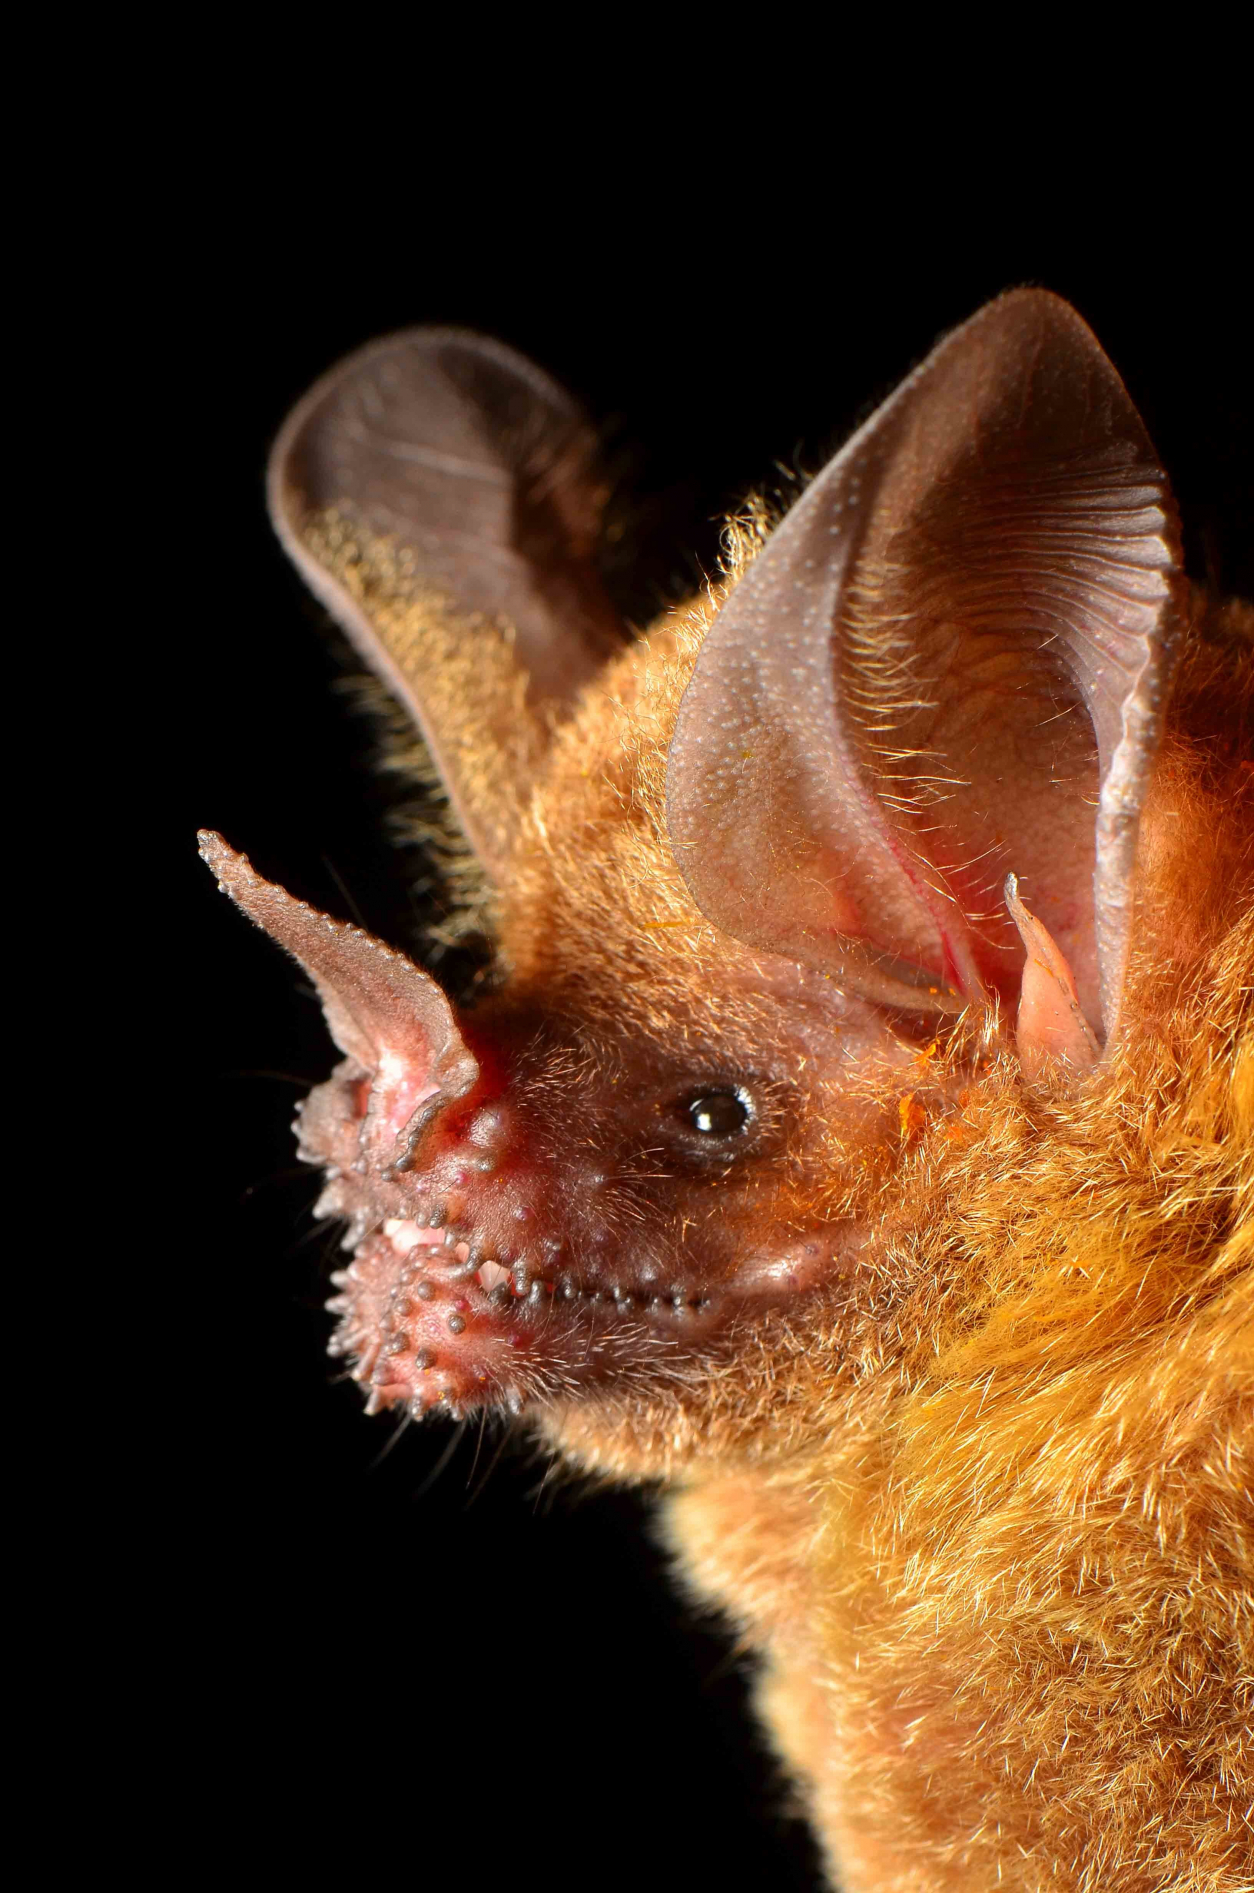 Up-close portrait of a Fring-lipped Bat